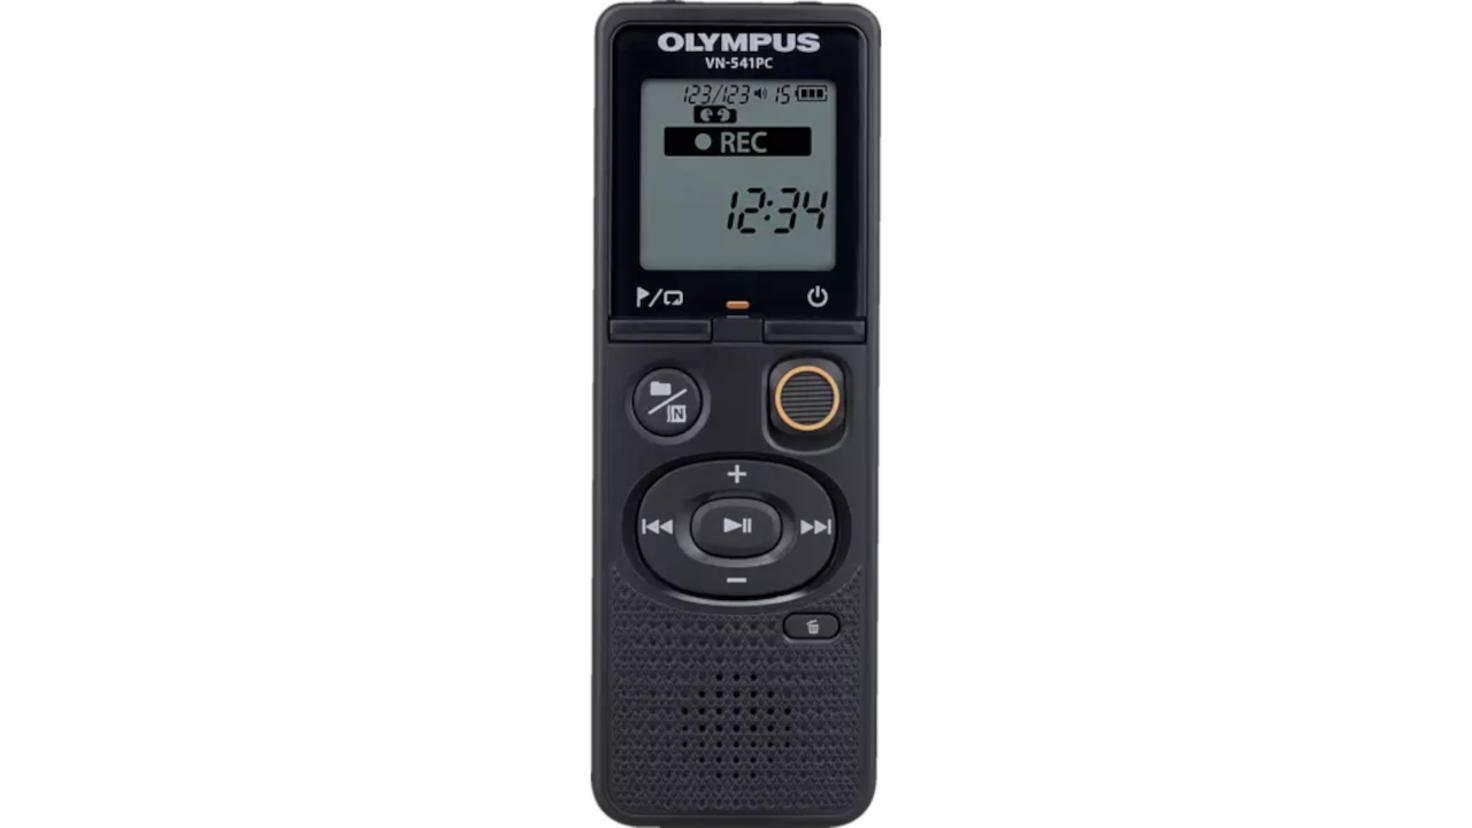 Olympus VN-541